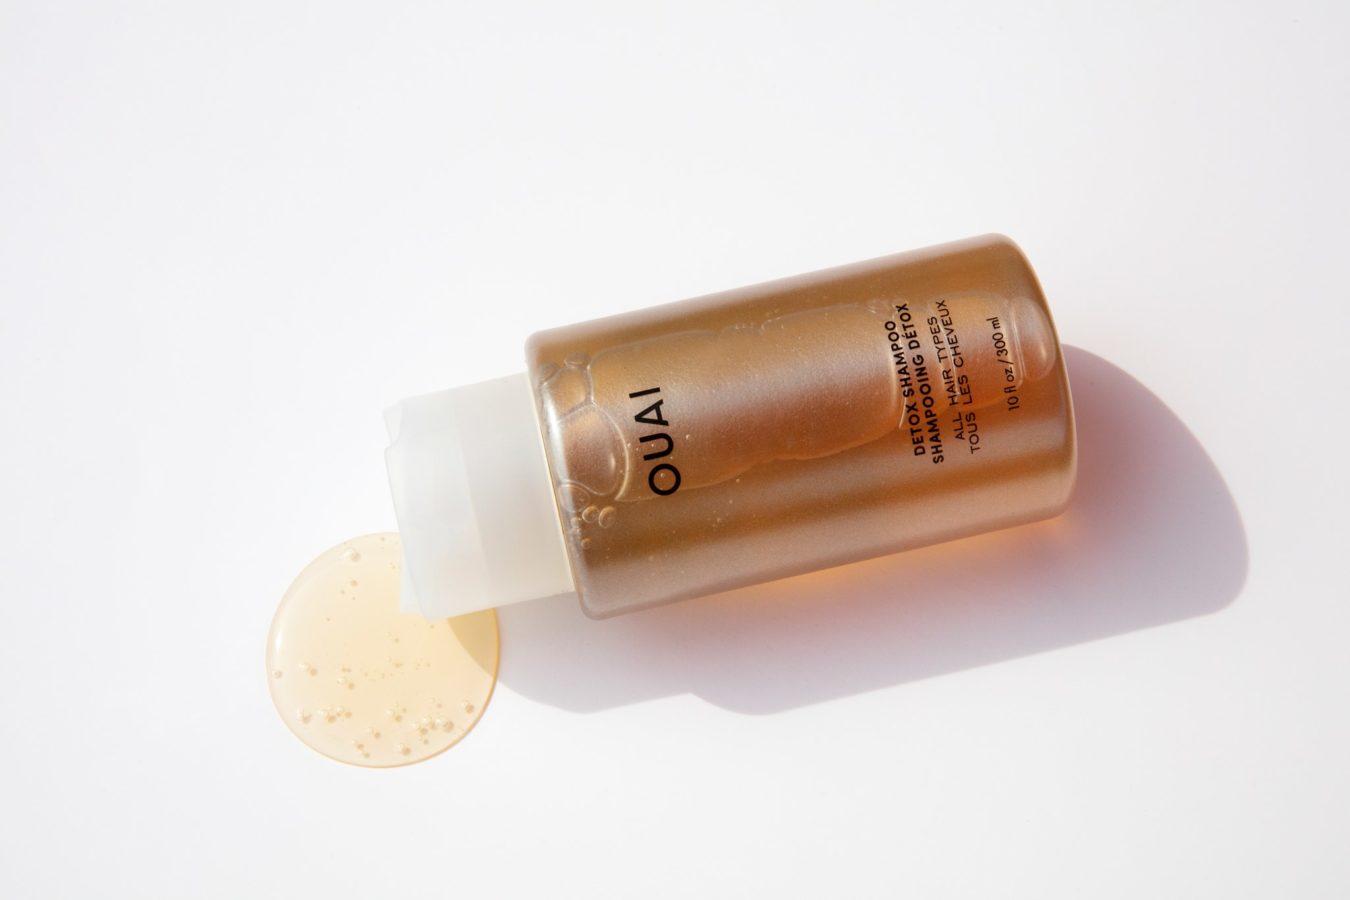 Best Clarifying Shampoos For Color Treated Hair!